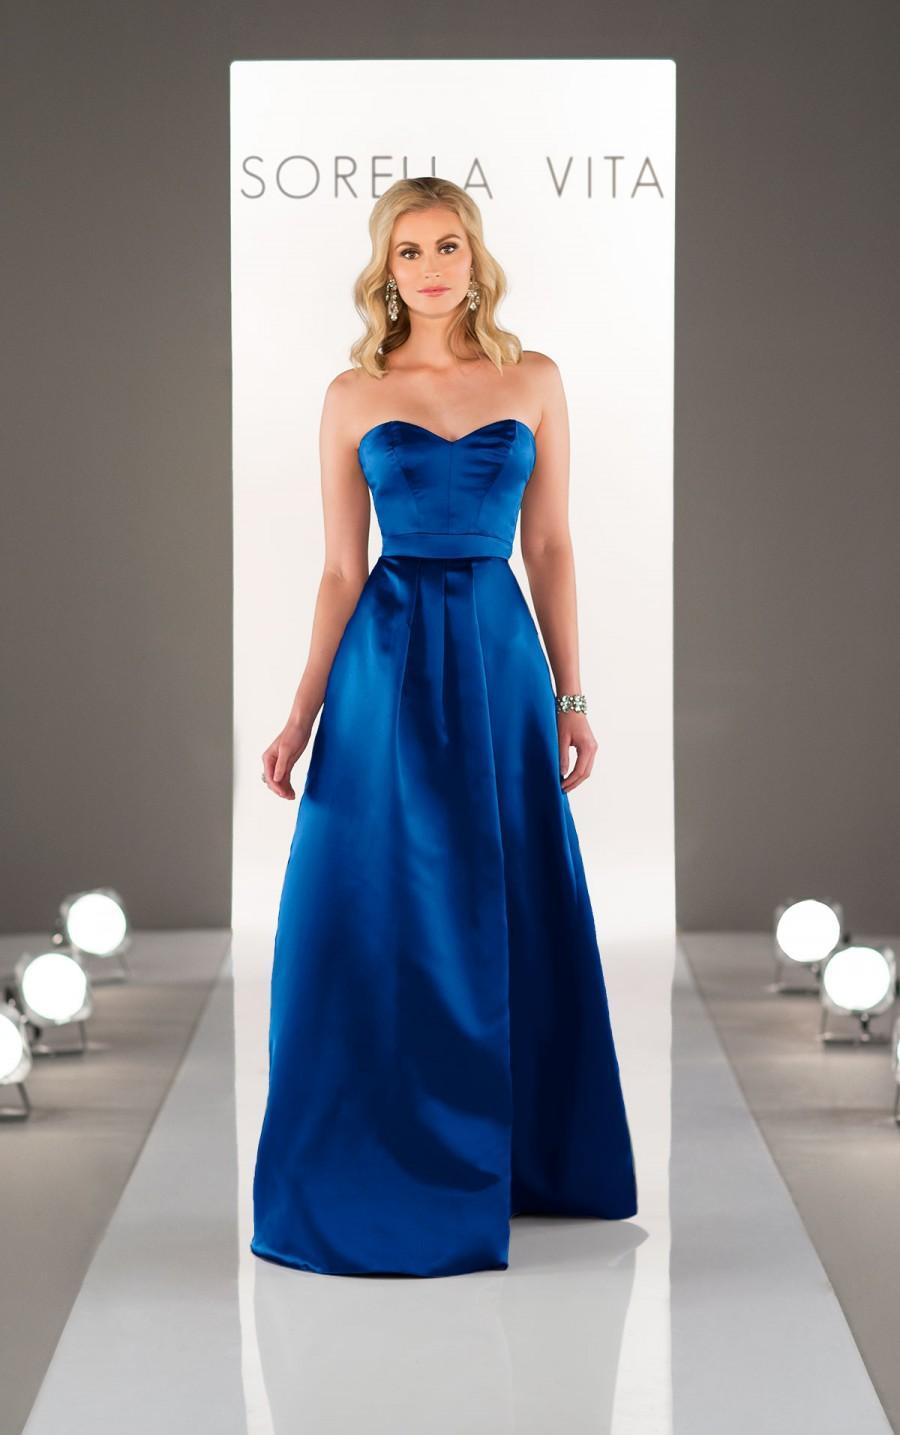 Wedding - Sorella Vita Satin Bridesmaid Dress Style 8653